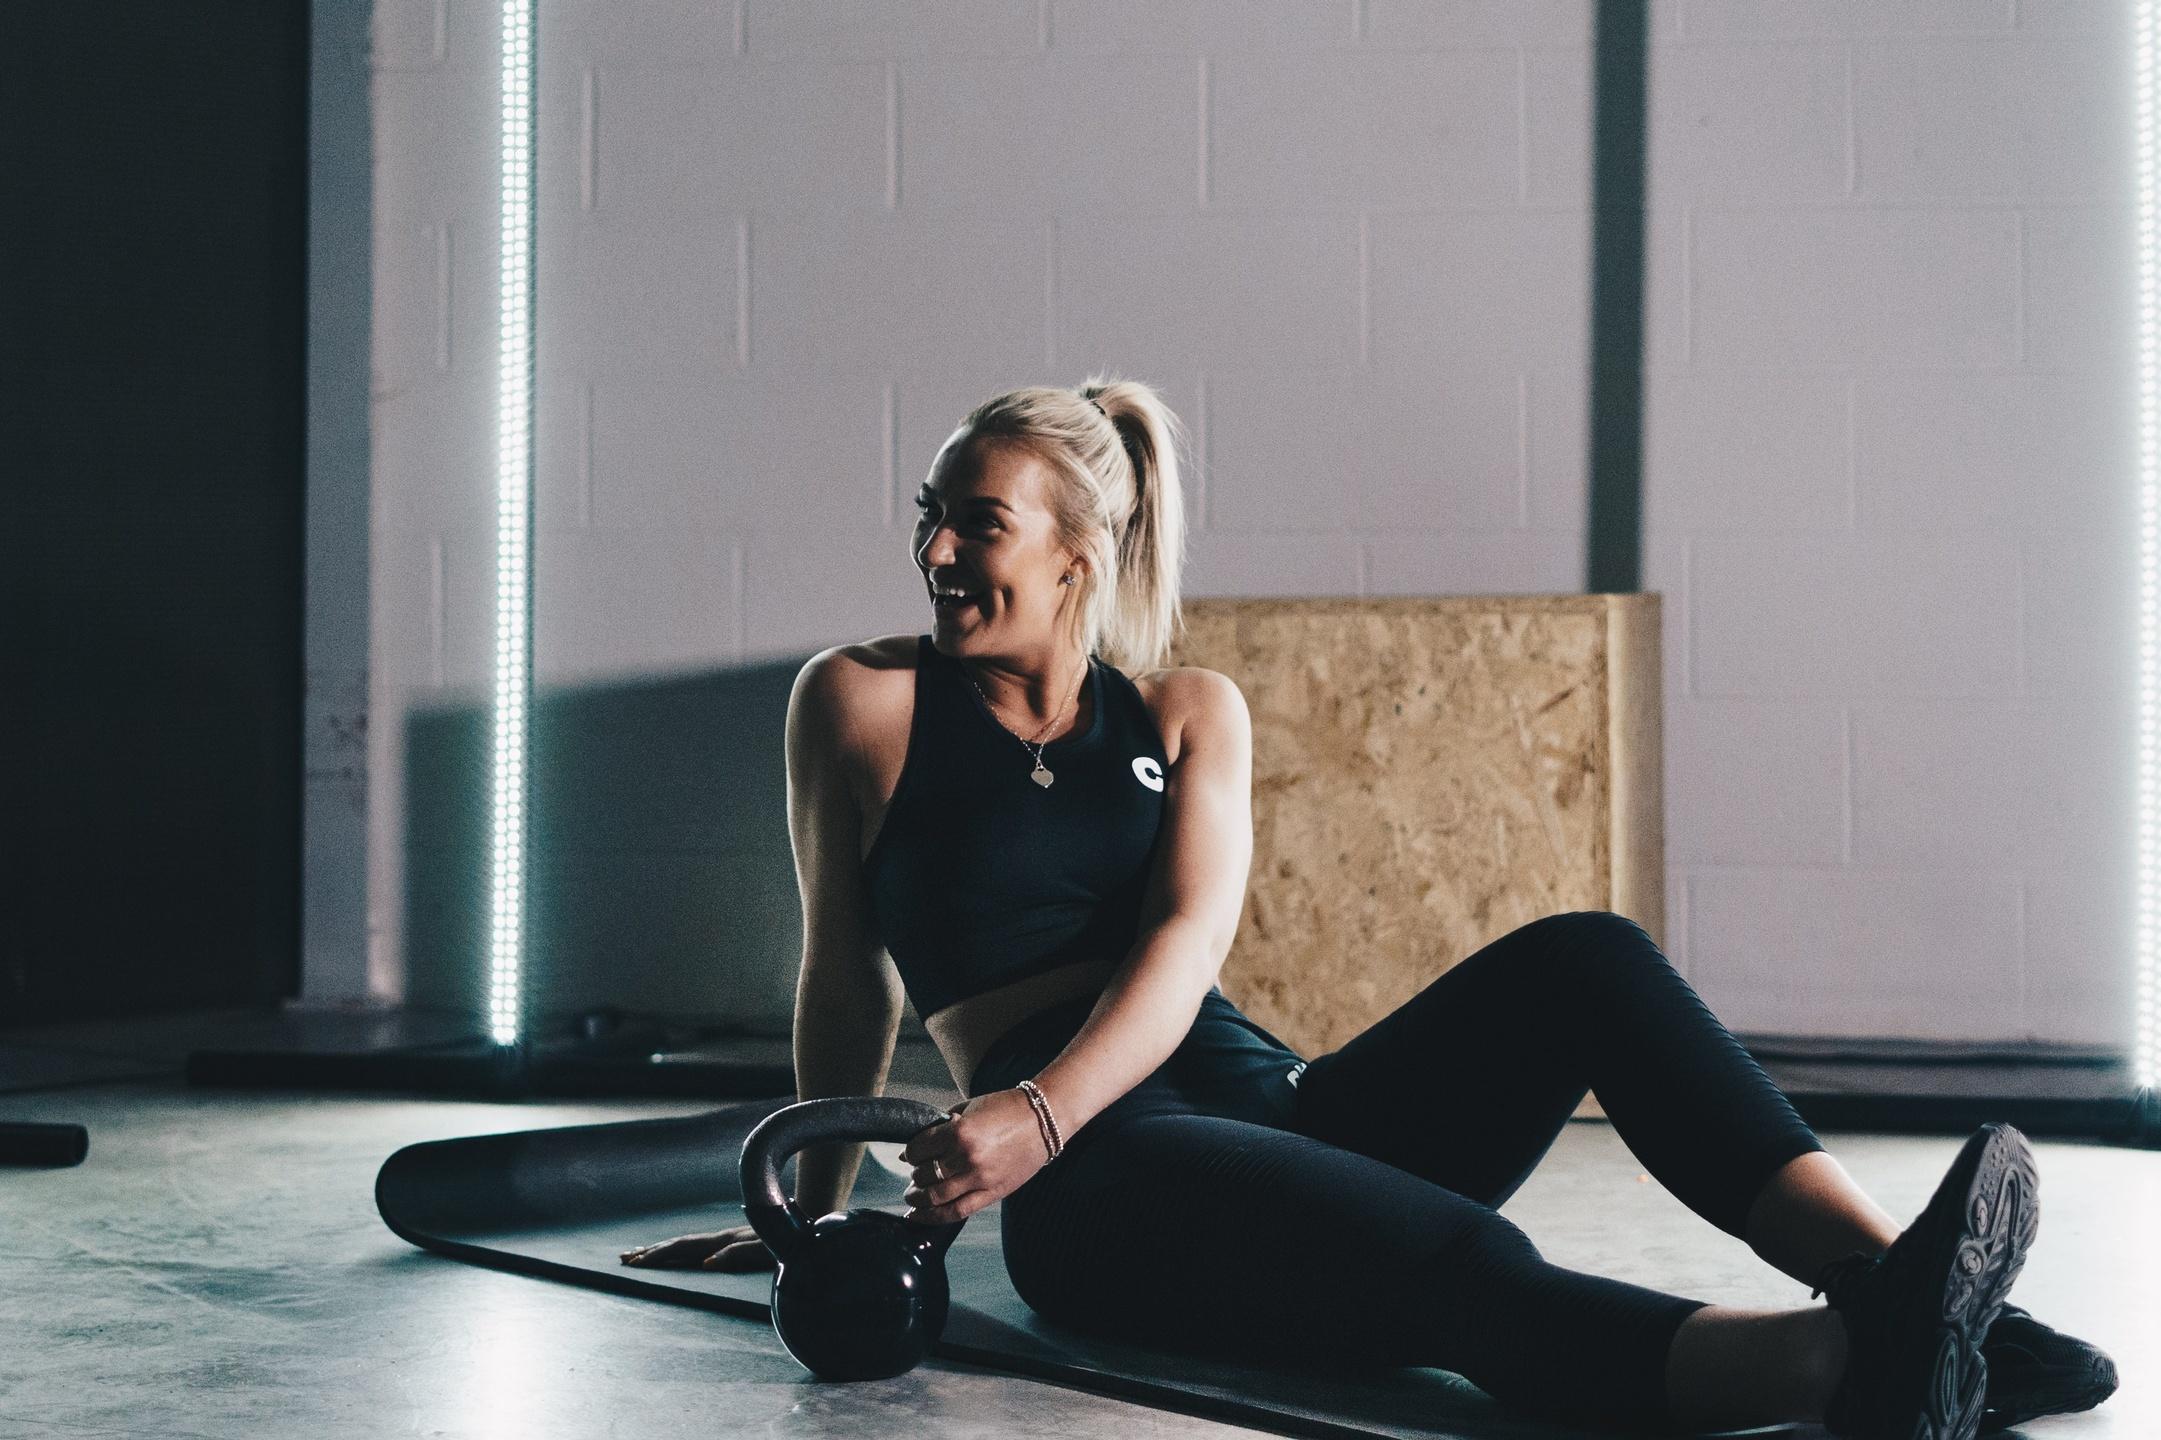 Postnatal Fitness online Helen Plass Personal Trainer